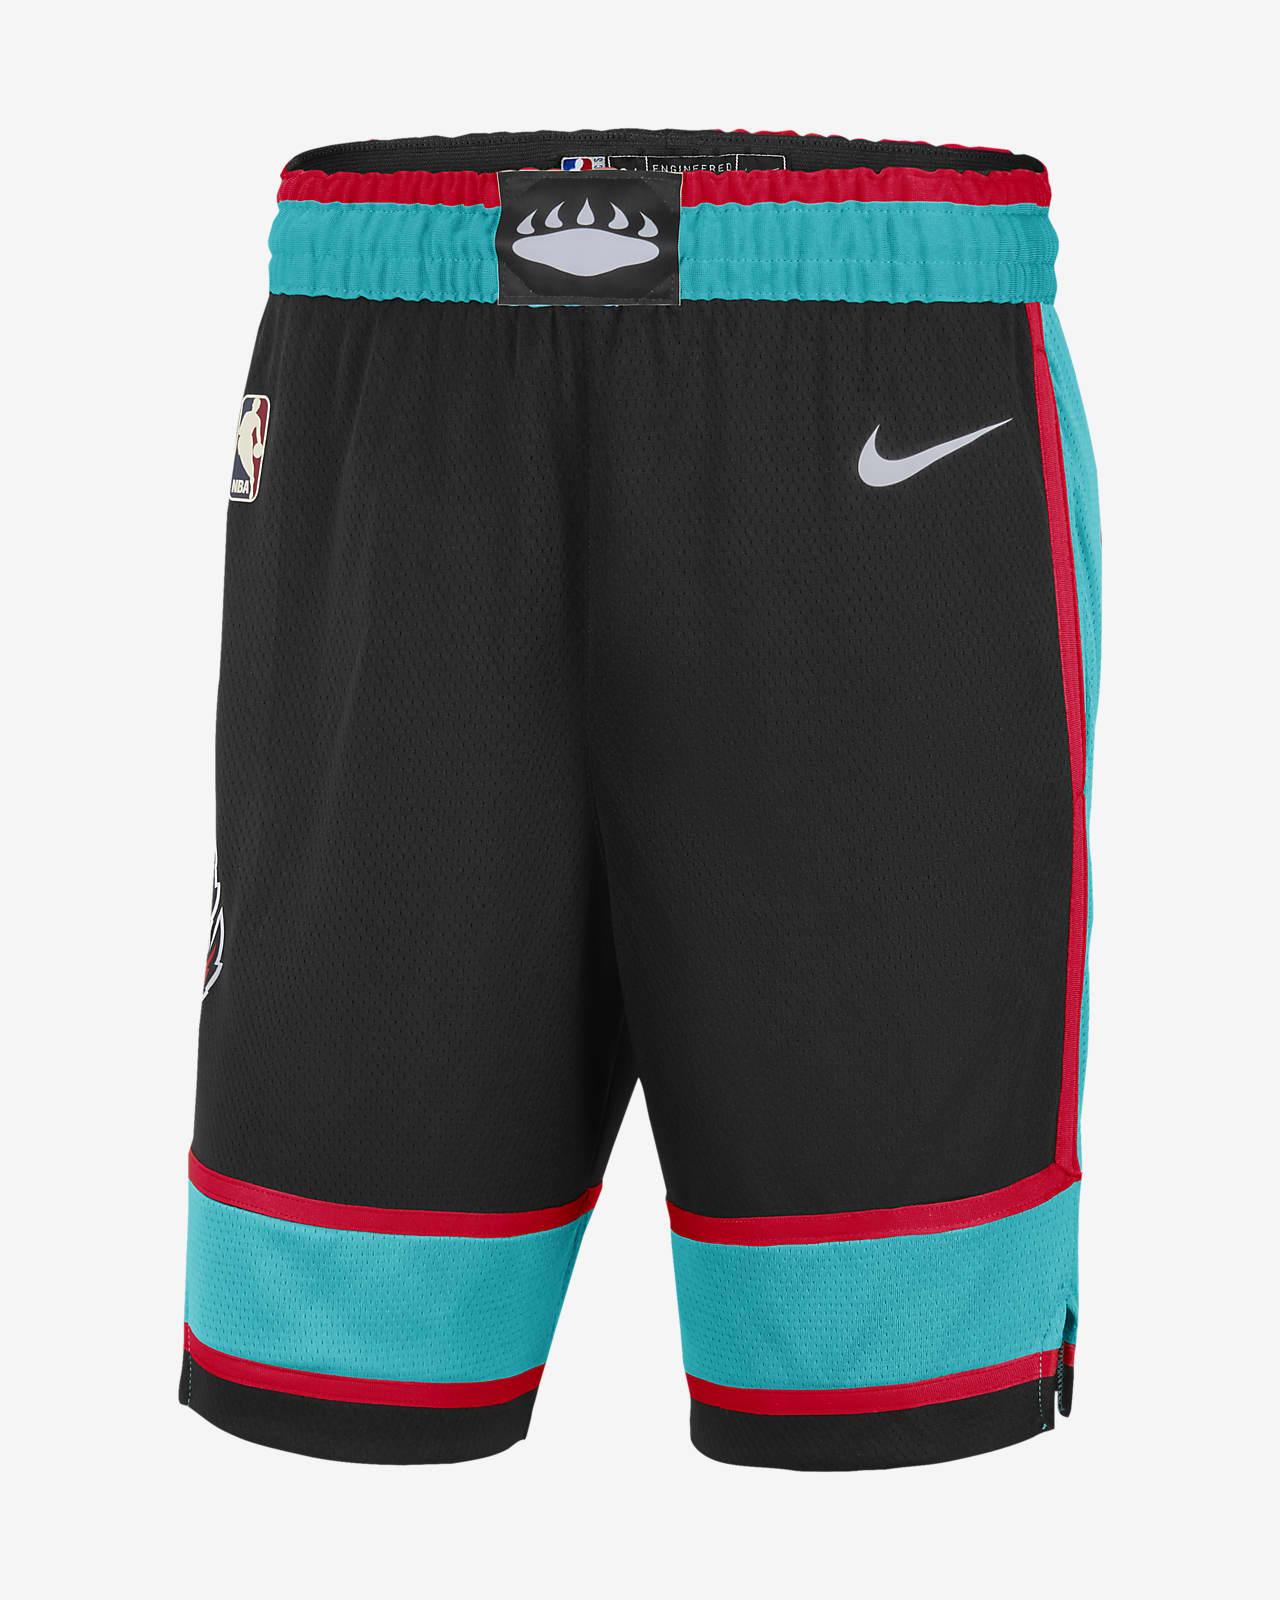 Memphis Grizzlies Classic Edition 2020 Nike NBA Swingman Shorts für Herren